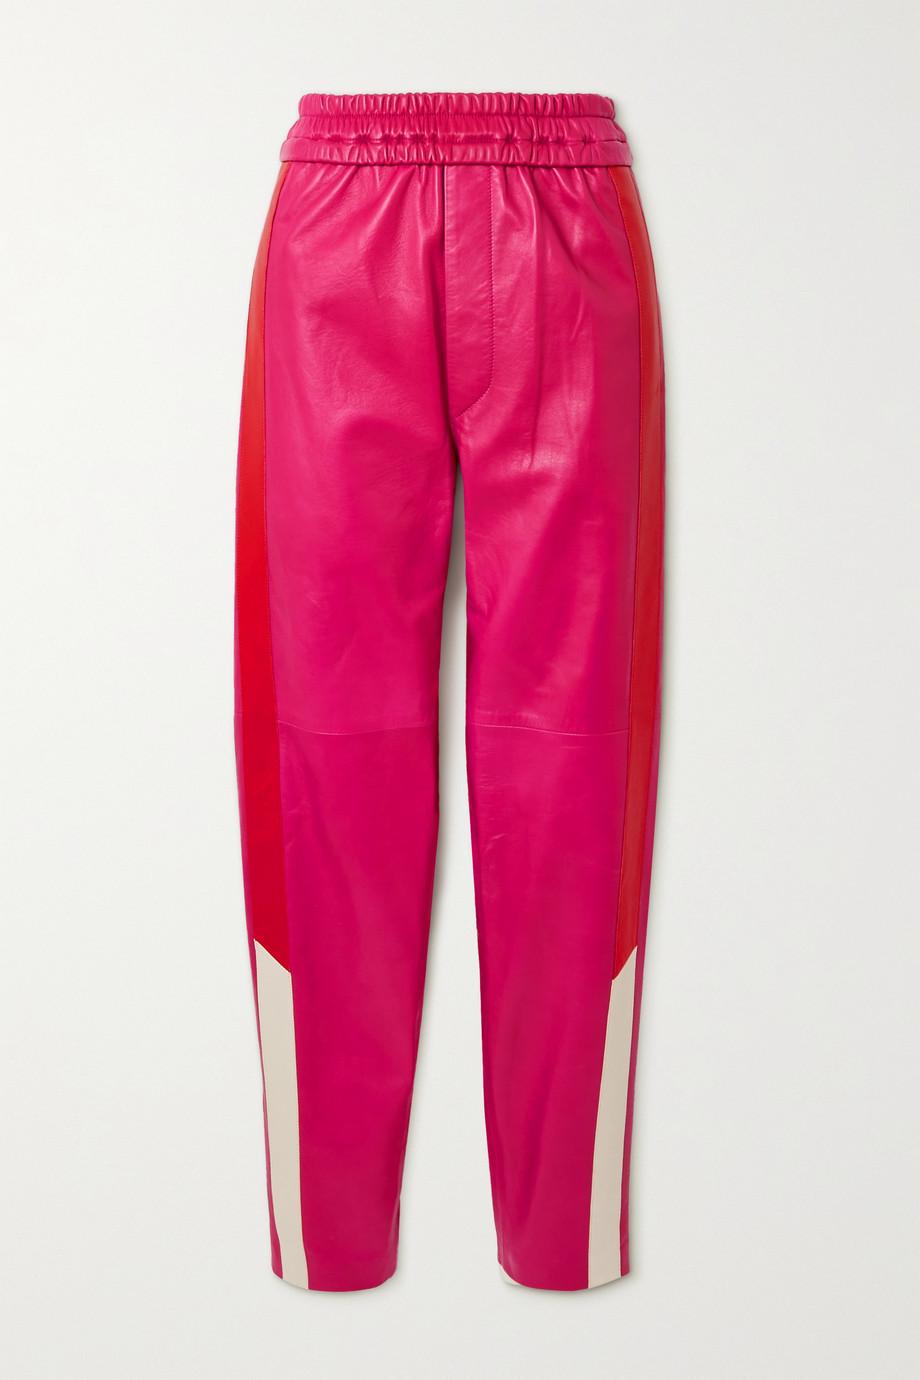 Isabel Marant Ailenoba striped leather track pants